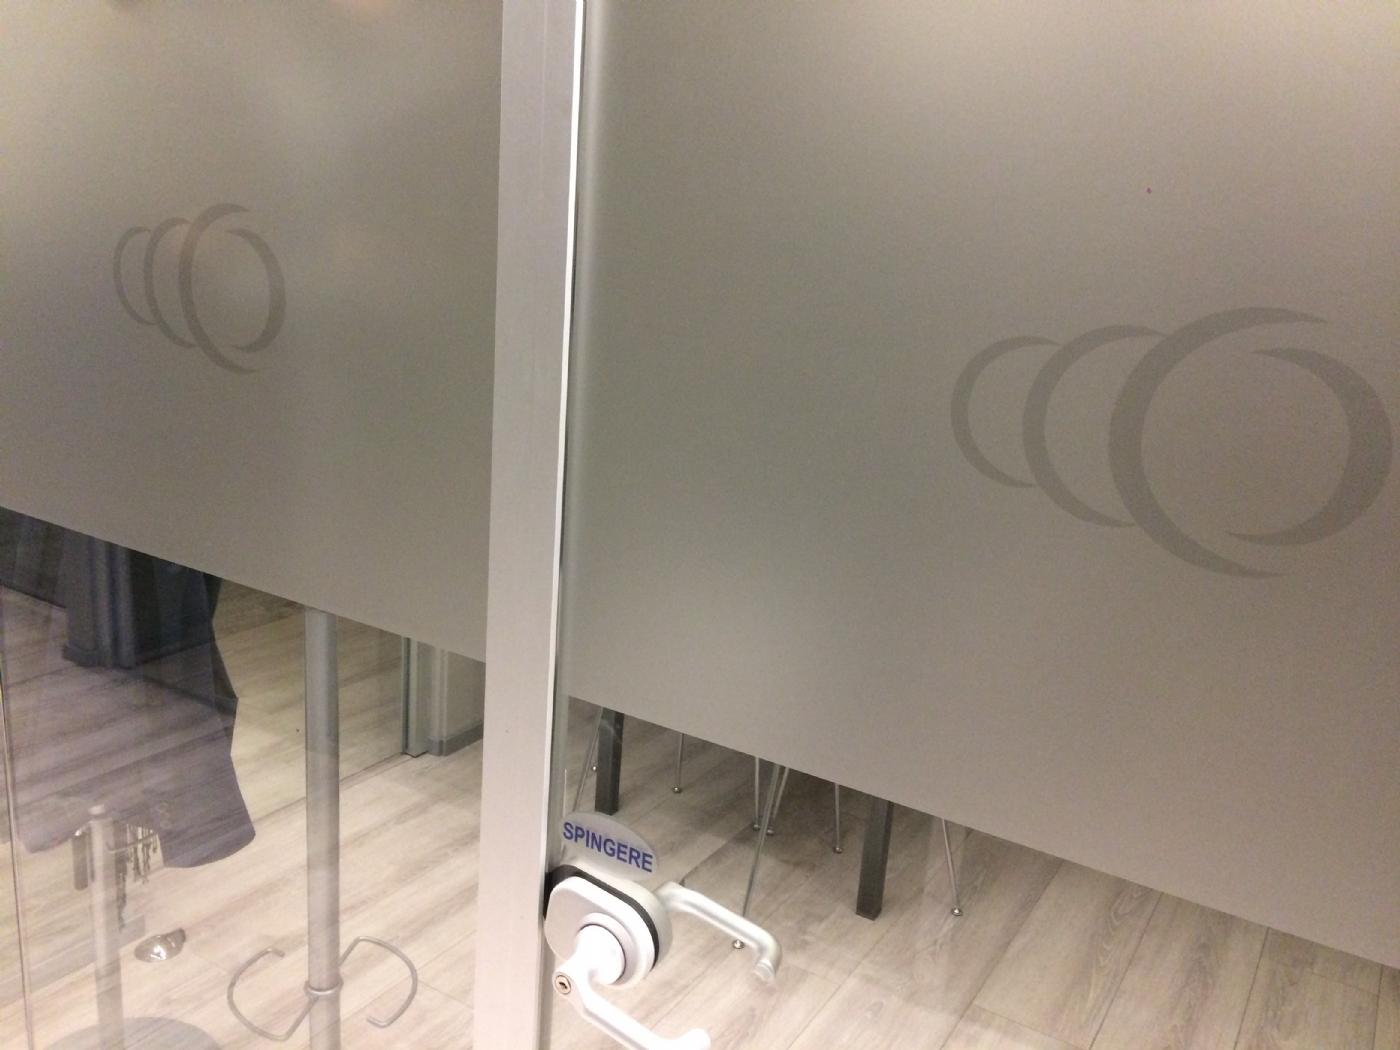 Pellicola adesiva effetto sabbiatura per vetri adesiva for Pellicola adesiva per vetri ikea